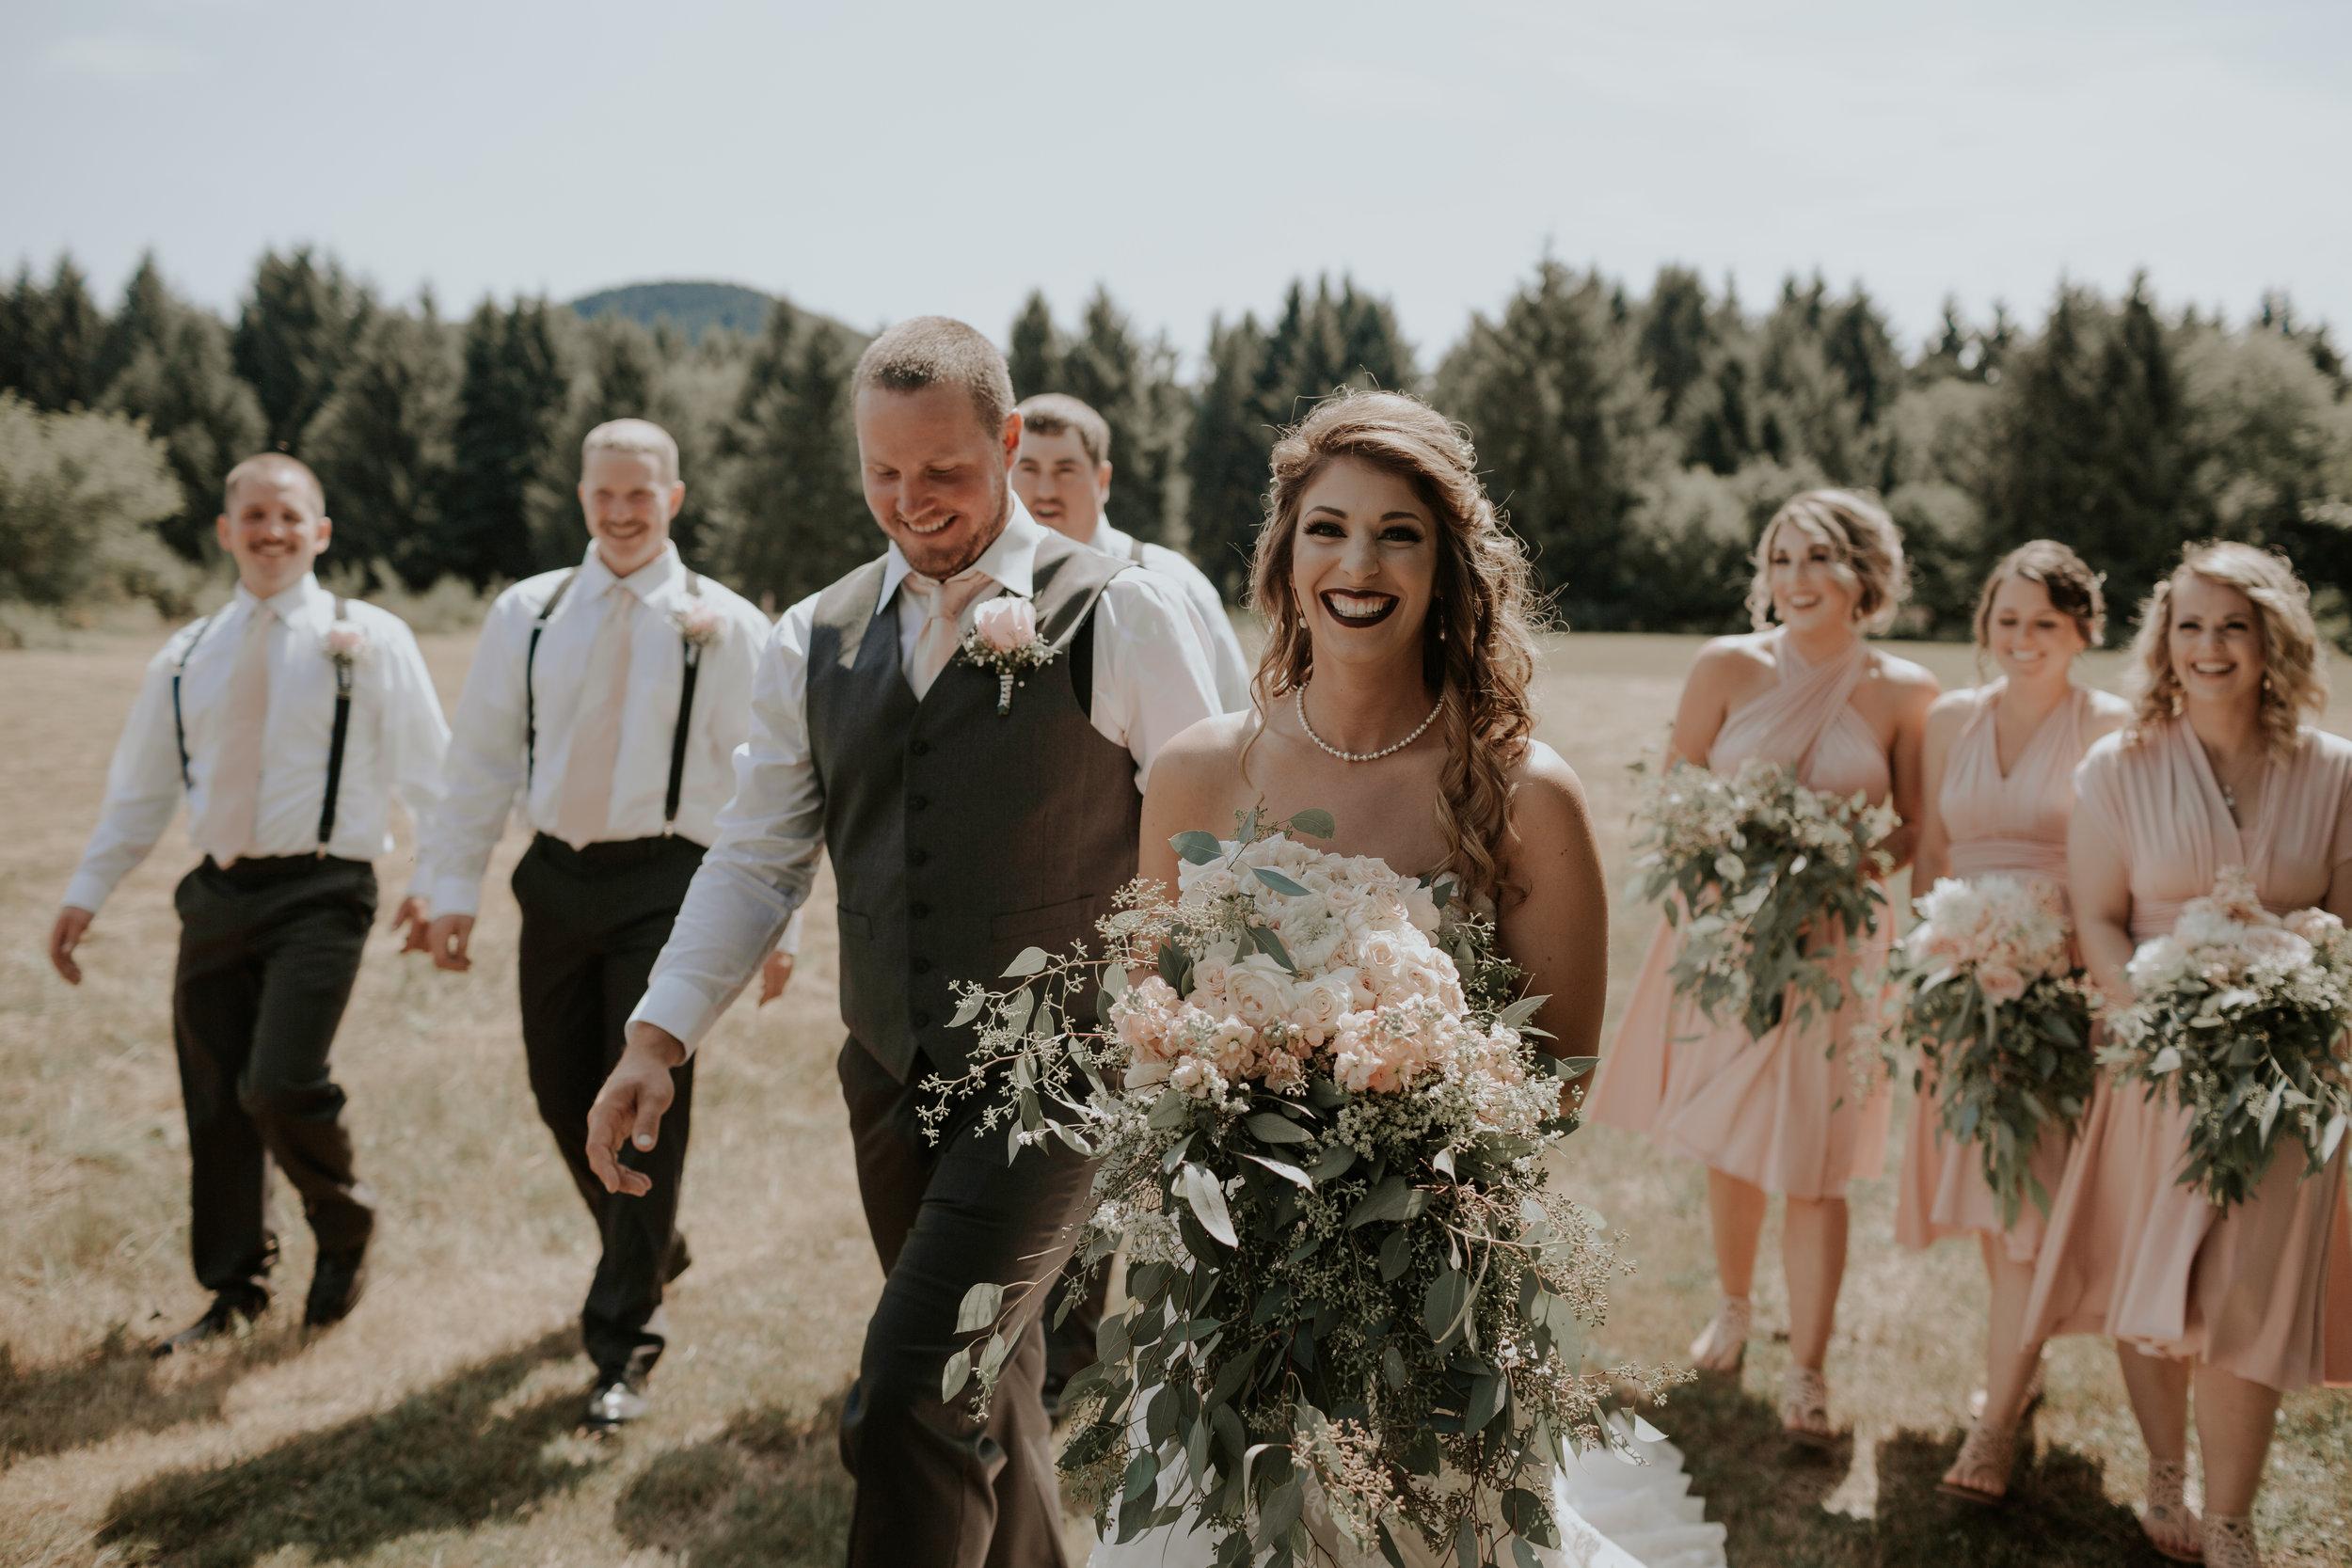 Olympic-Peninsula-Wedding-Photographer-PNW-Forks-Port-Angeles-Kayla-Dawn-Photography-engagement-Olympic-National-Park-18.jpg